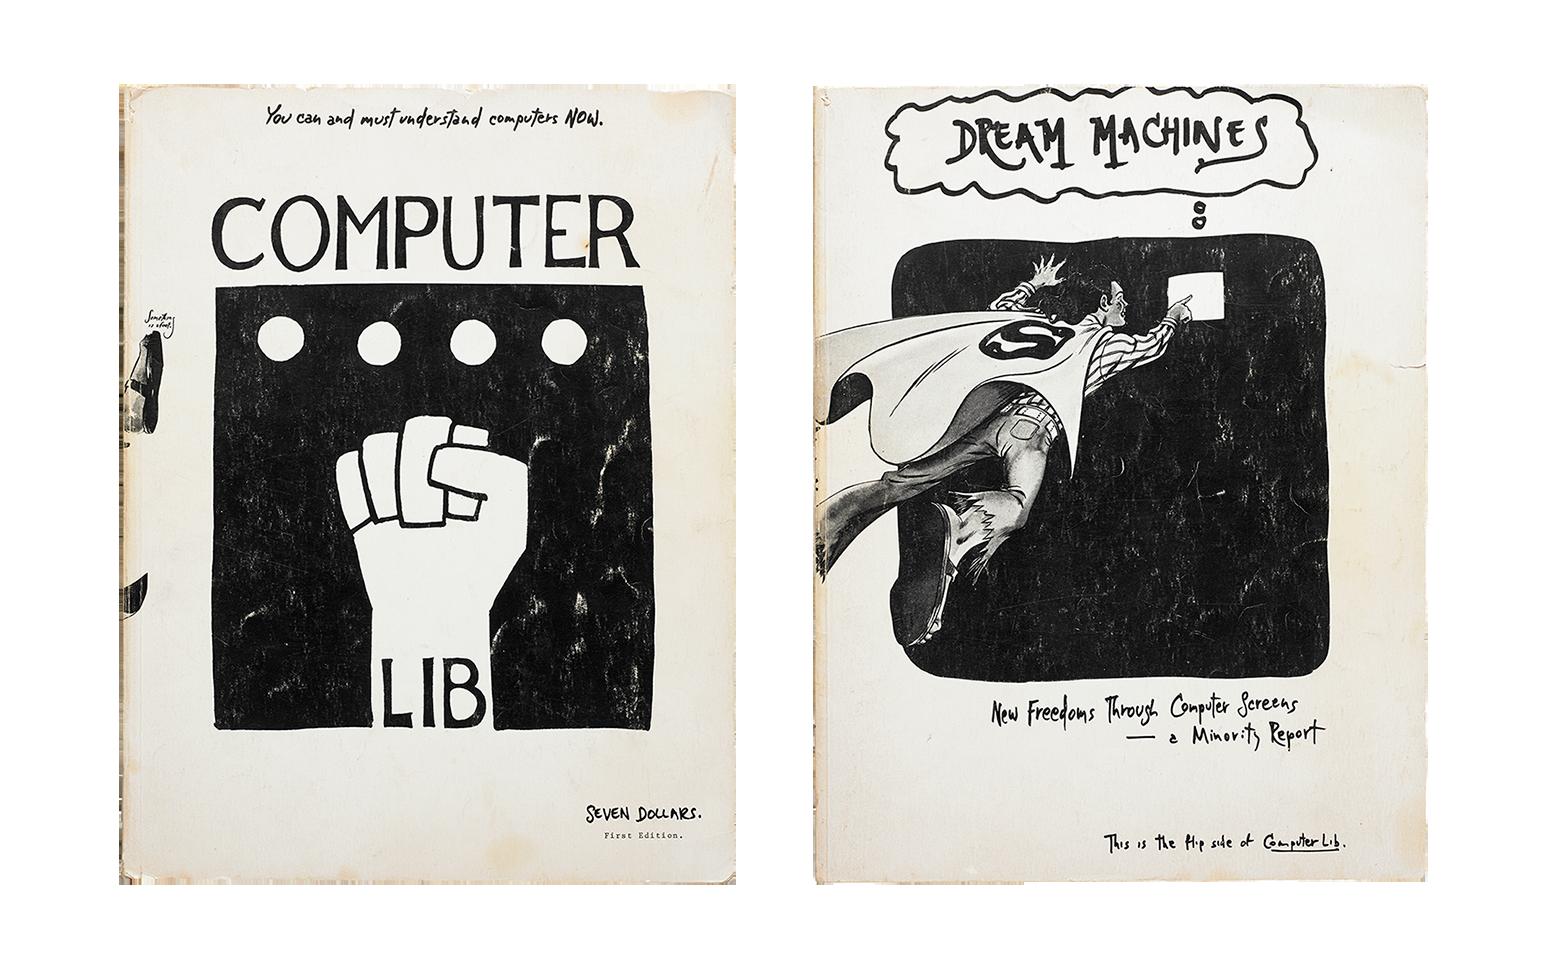 Computer Lib Dream Machines